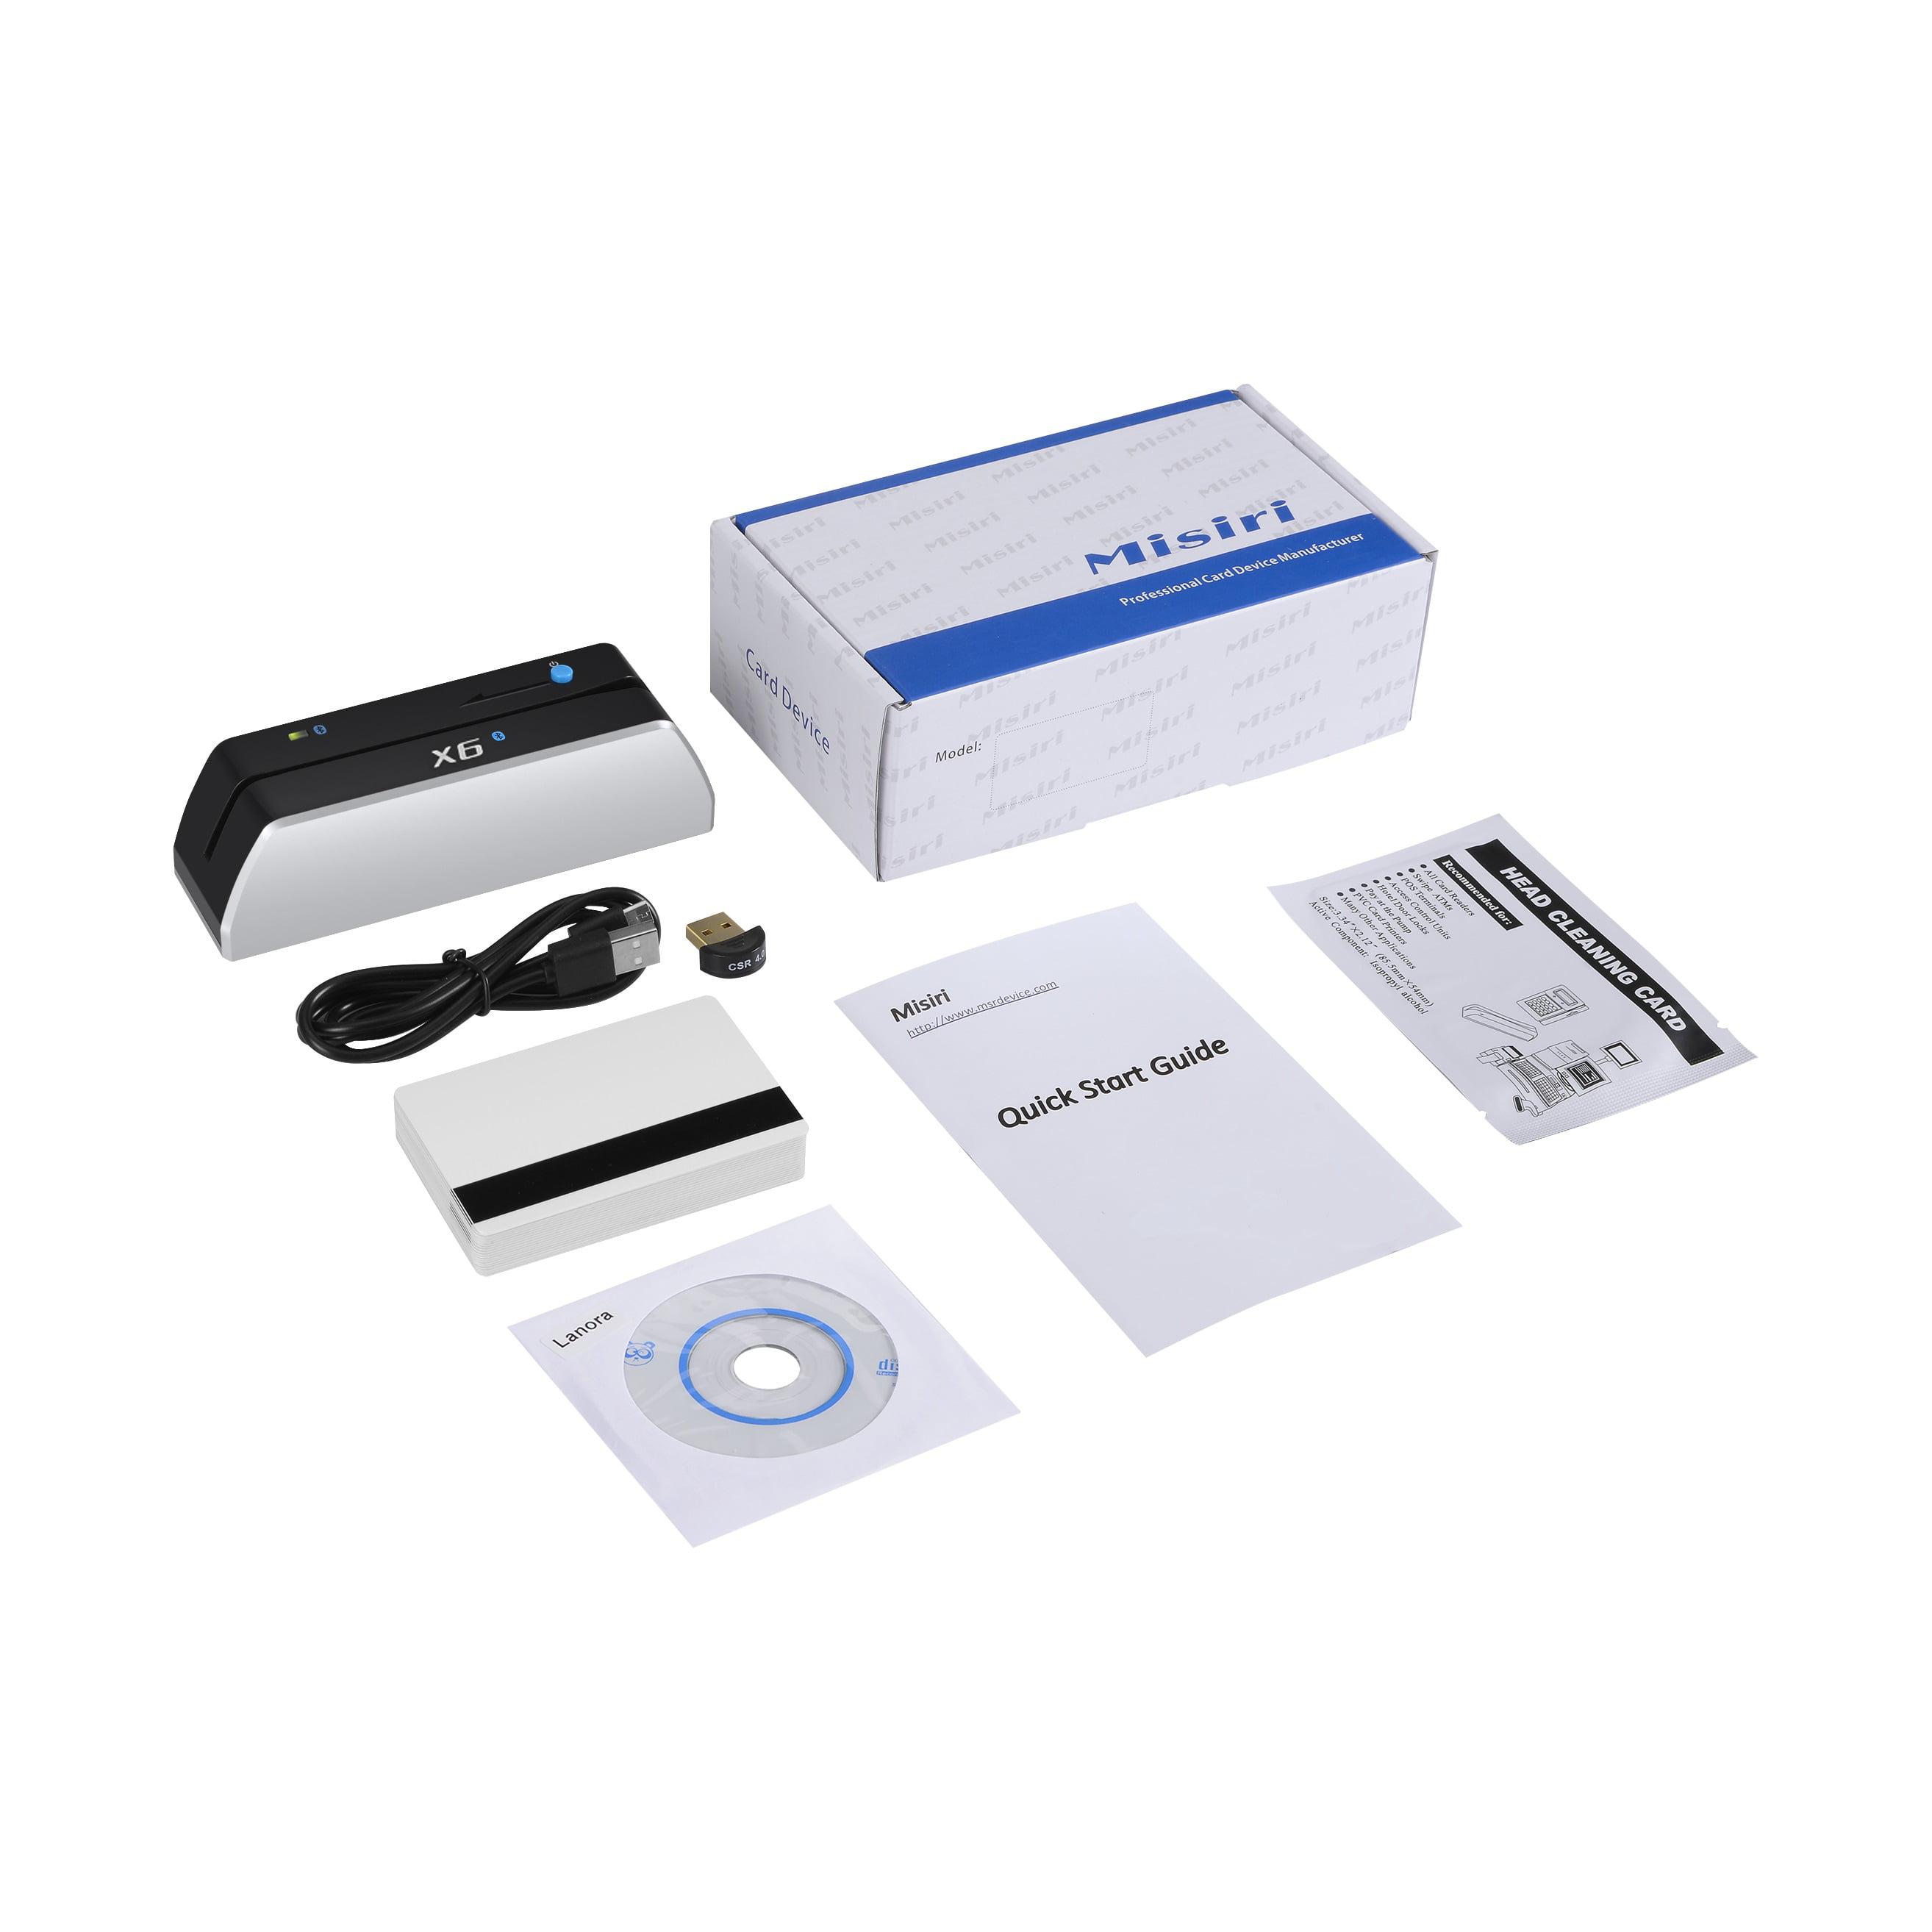 Misiri Bluetooth X6(BT) Magnetic Stripe Card Reader Write...